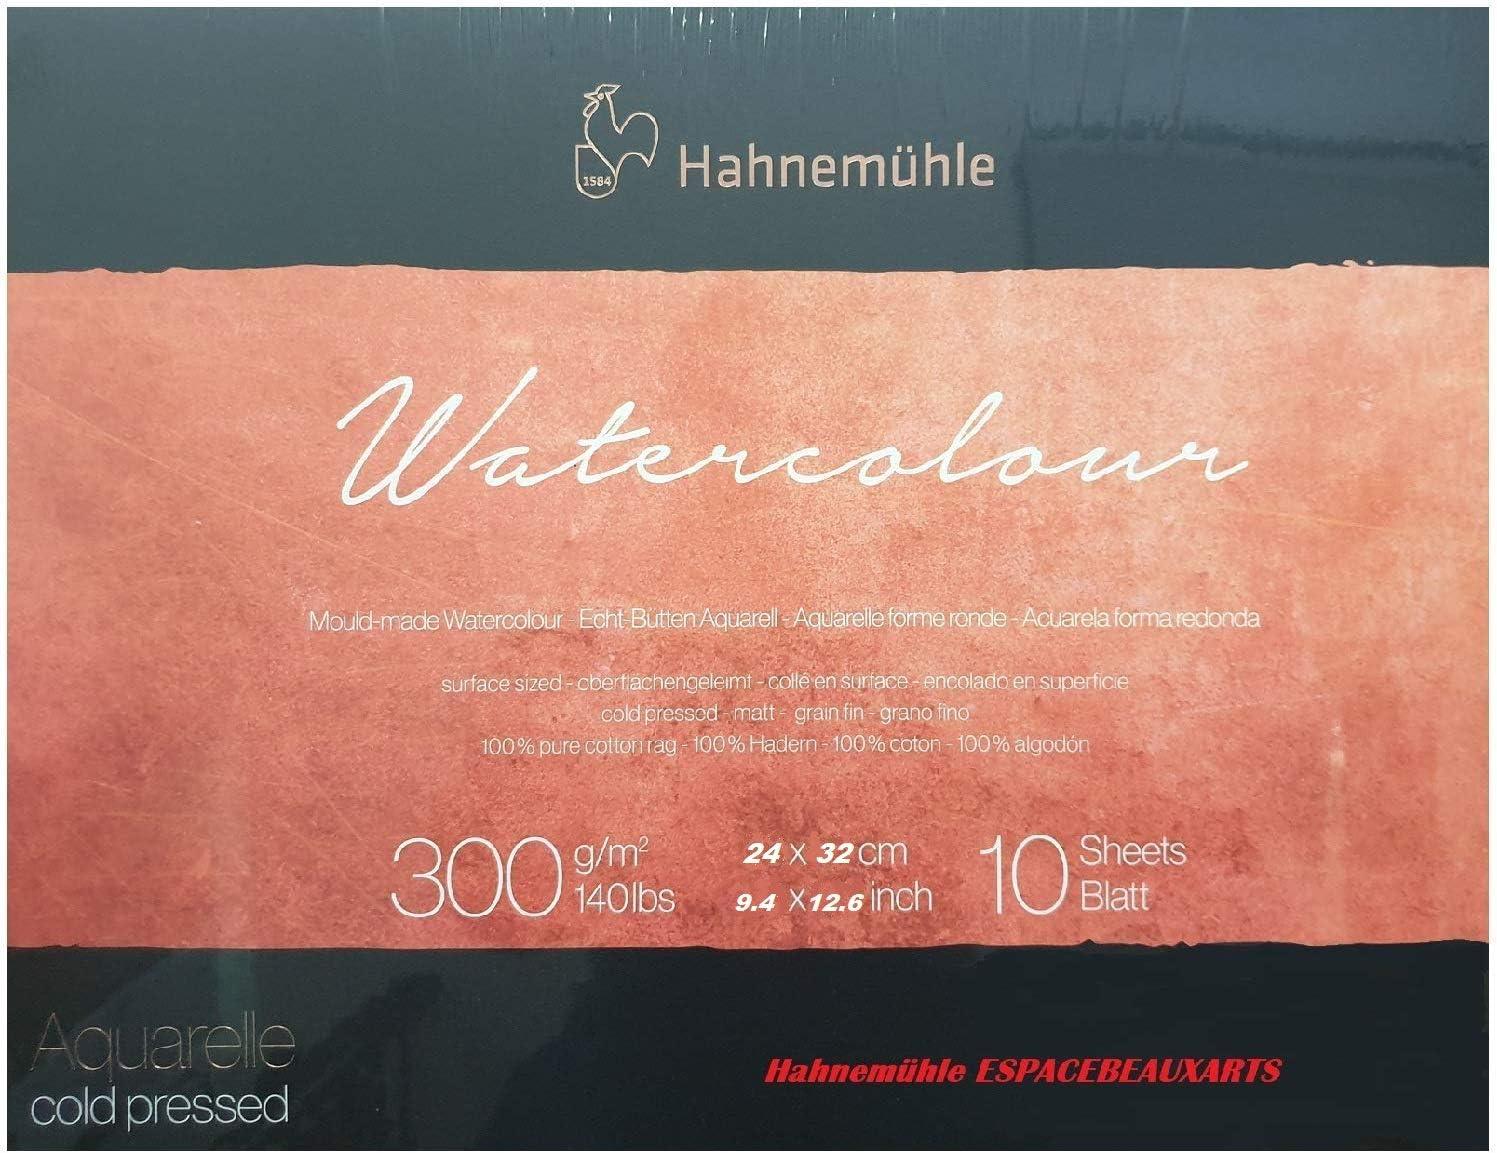 Hahnemühle - Bloque de acuarela, 10 hojas, 300 g, 24 x 32 cm, 100 ...